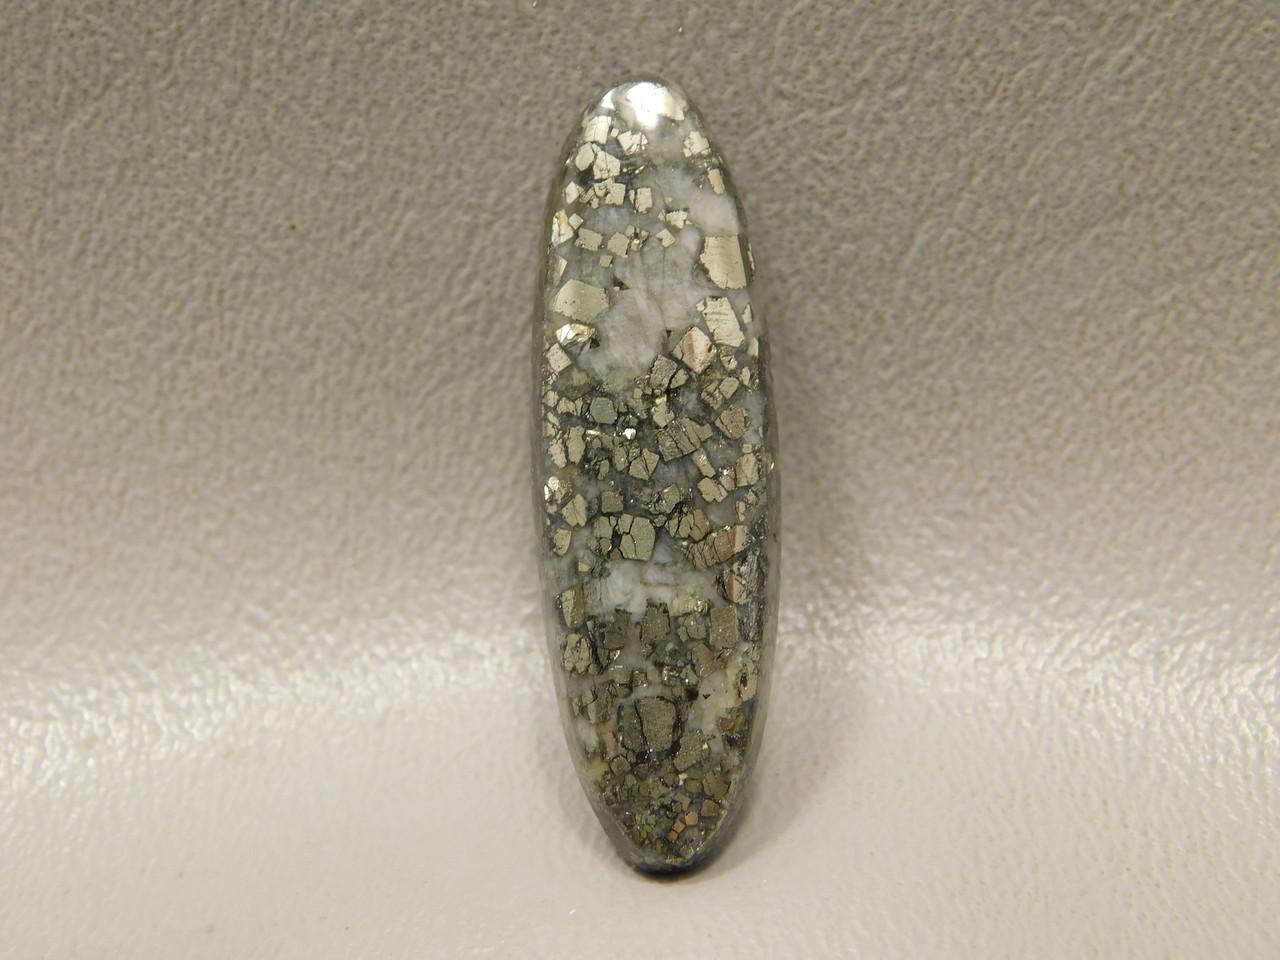 Pyrite Agate Designer  Cabochon Loose Stone for Jewelry Design #9